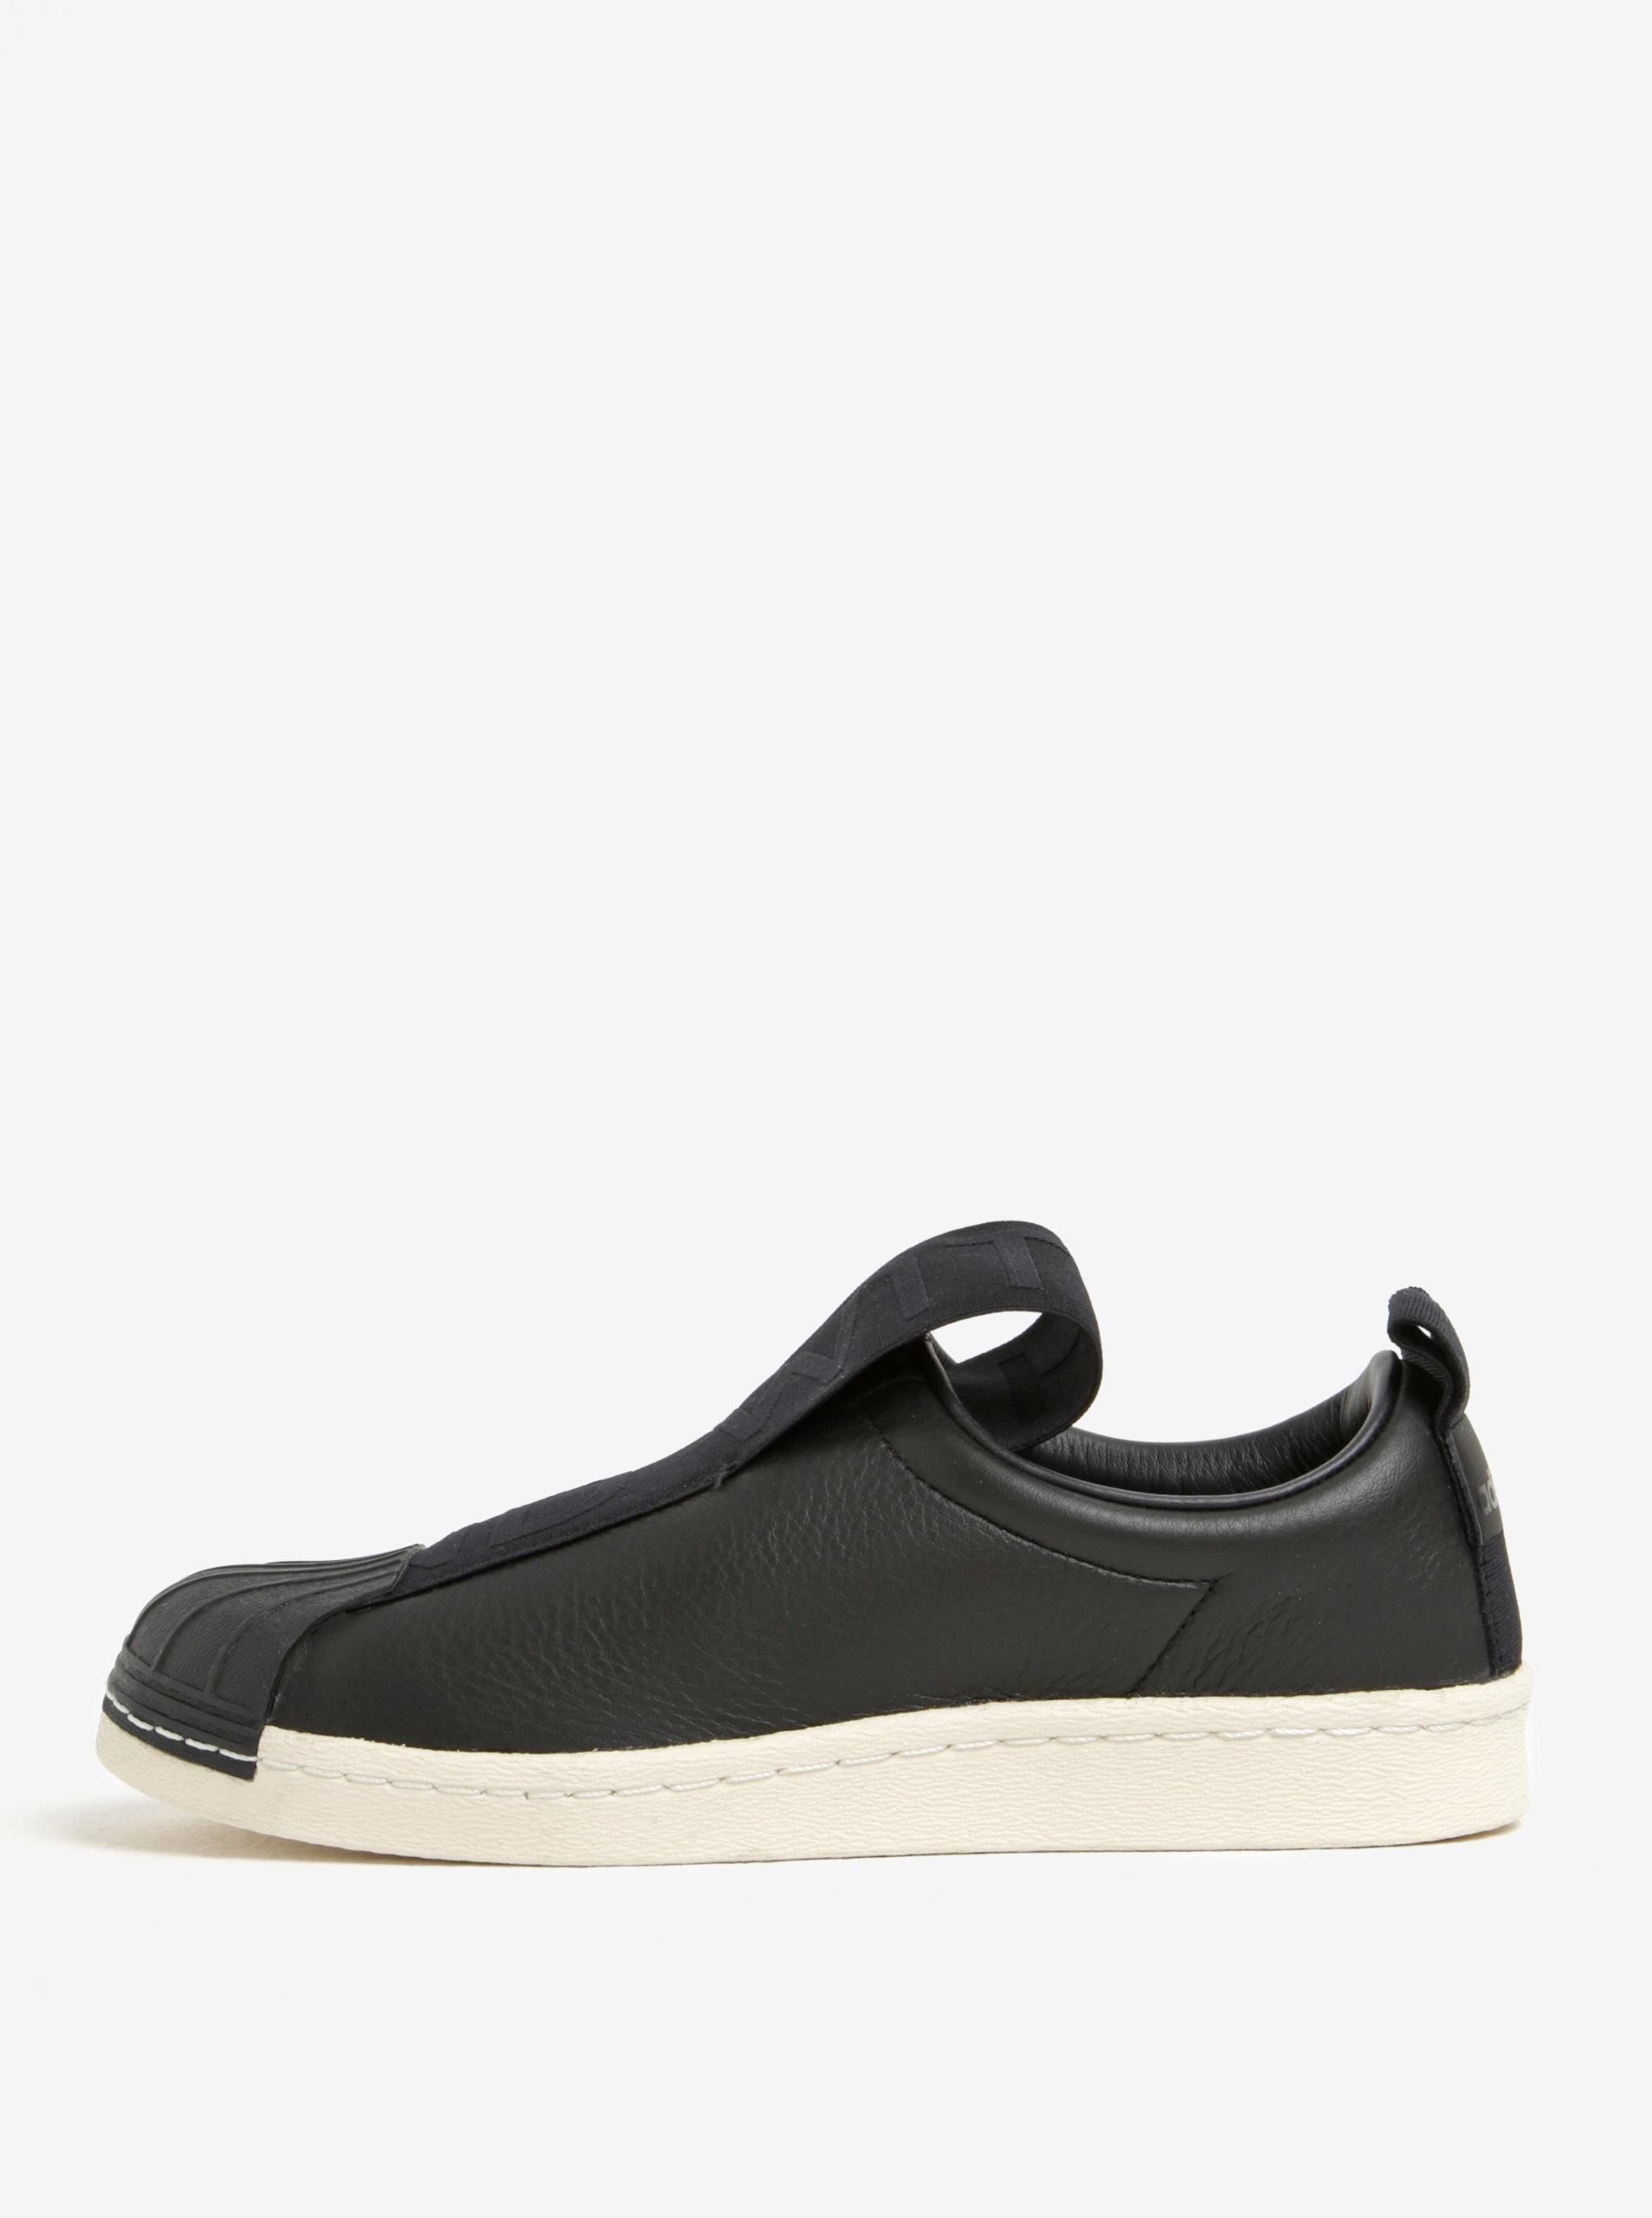 Čierne dámske kožené slip on adidas Originals Superstar ... 84060b26cac